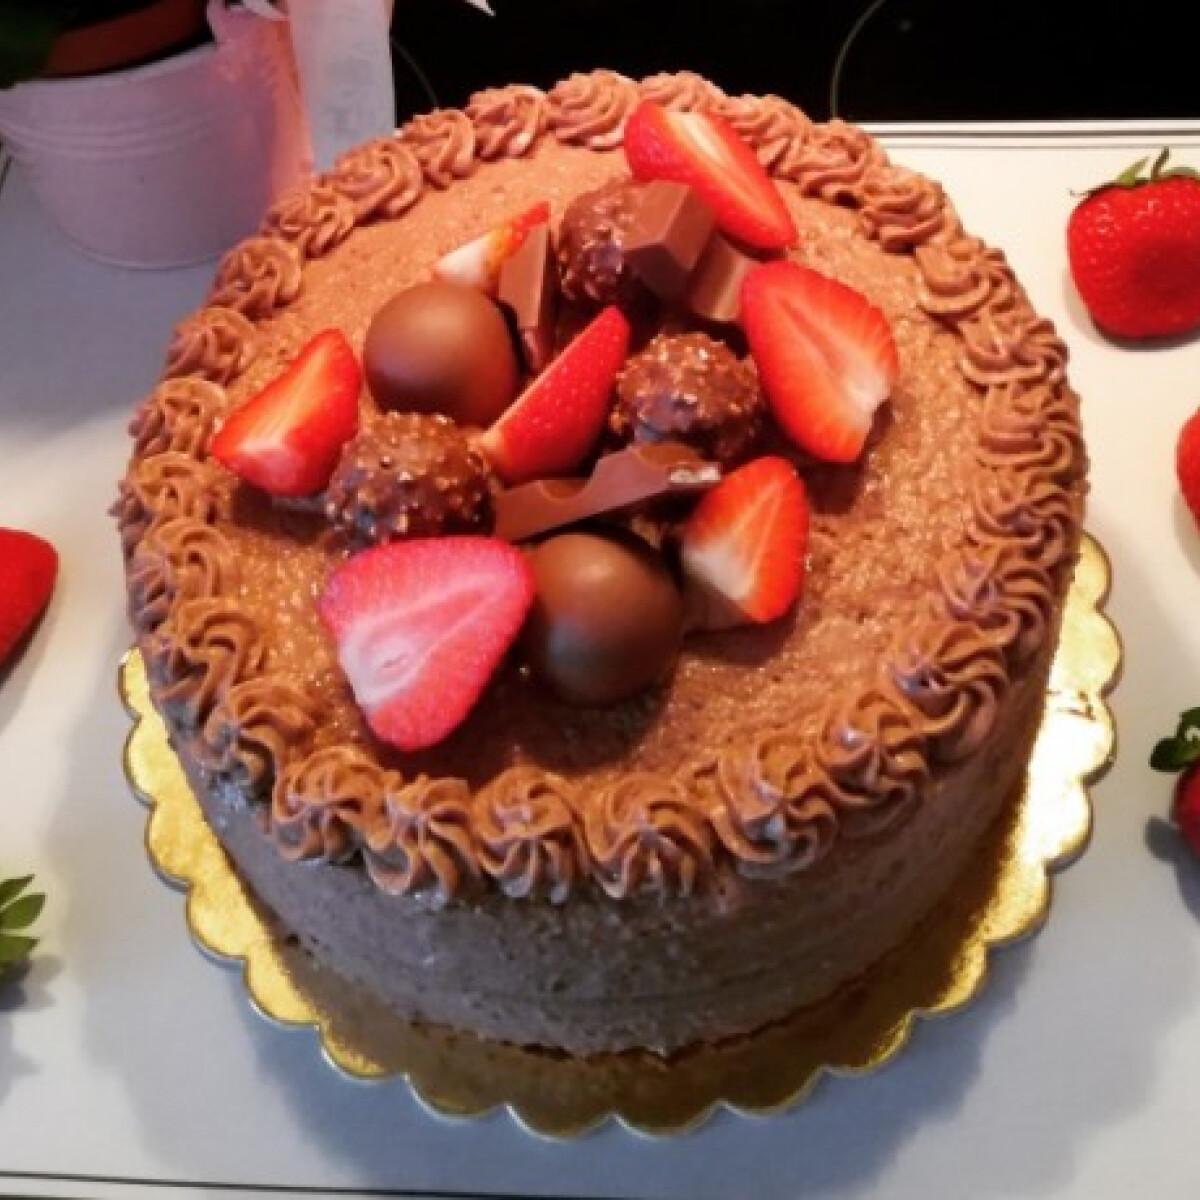 Epres-csokis szerelembomba